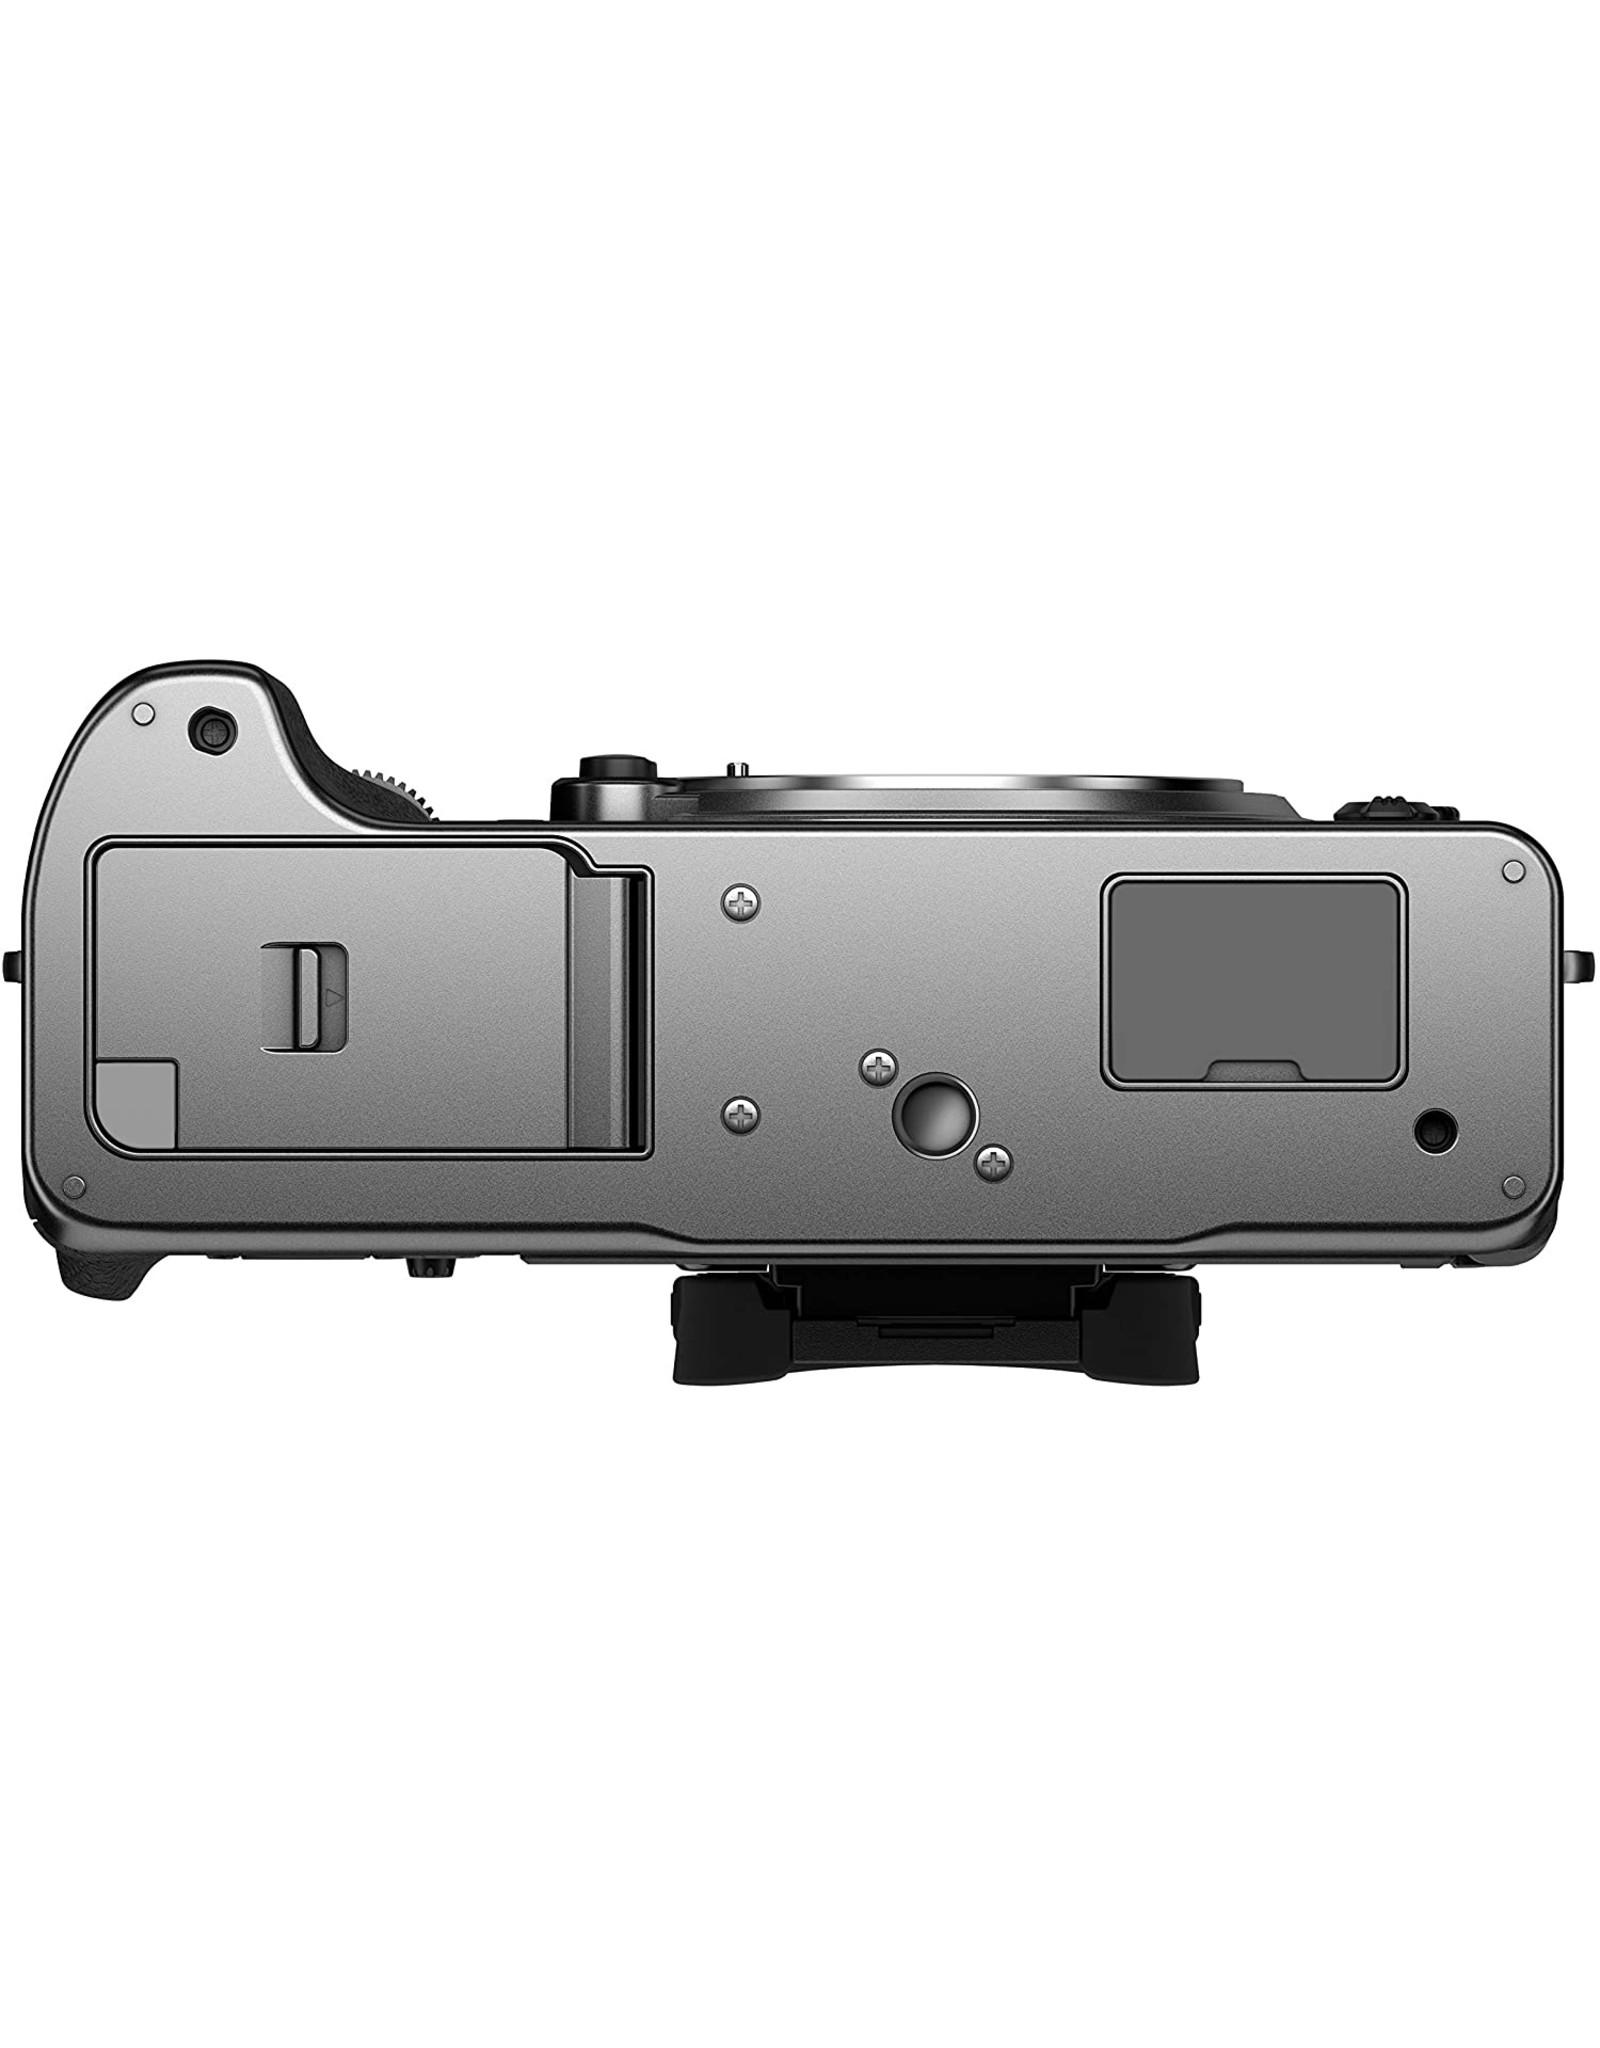 Fujifilm Fuji X-T4 Silver